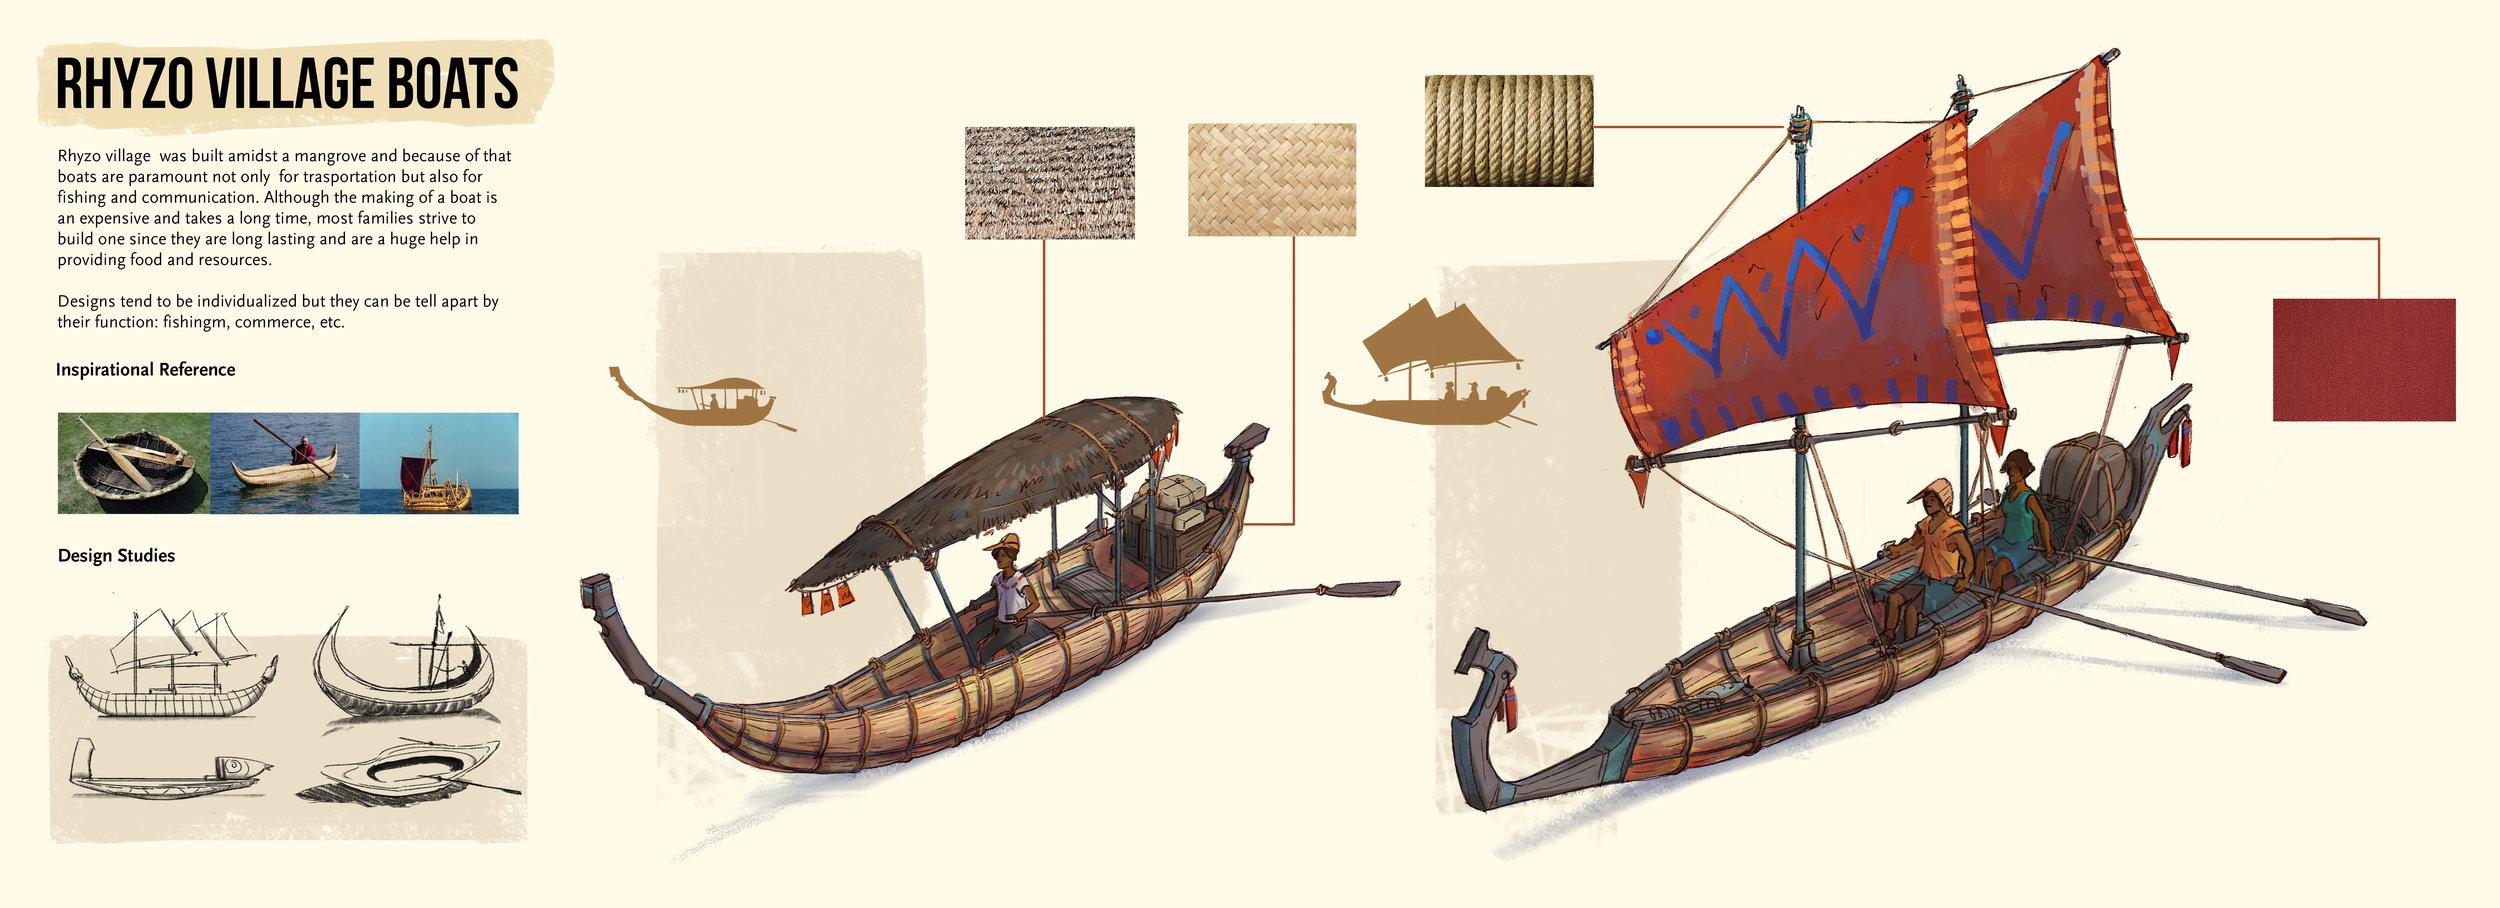 Rhyzo Village boats.jpg